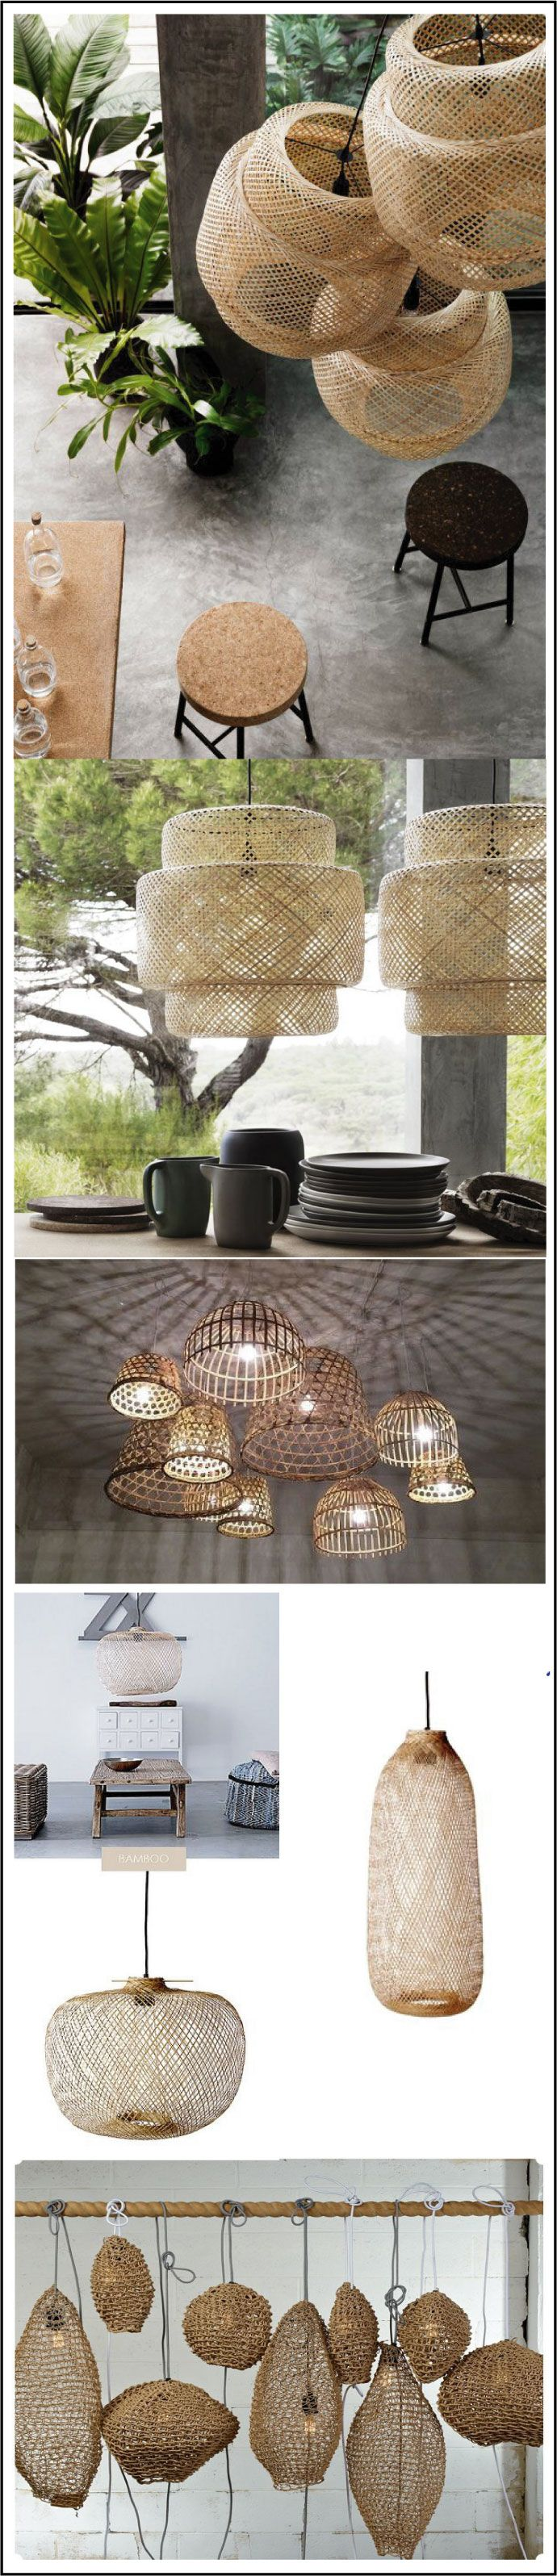 tendance rotin osier luminaires en rotin chiara stella. Black Bedroom Furniture Sets. Home Design Ideas